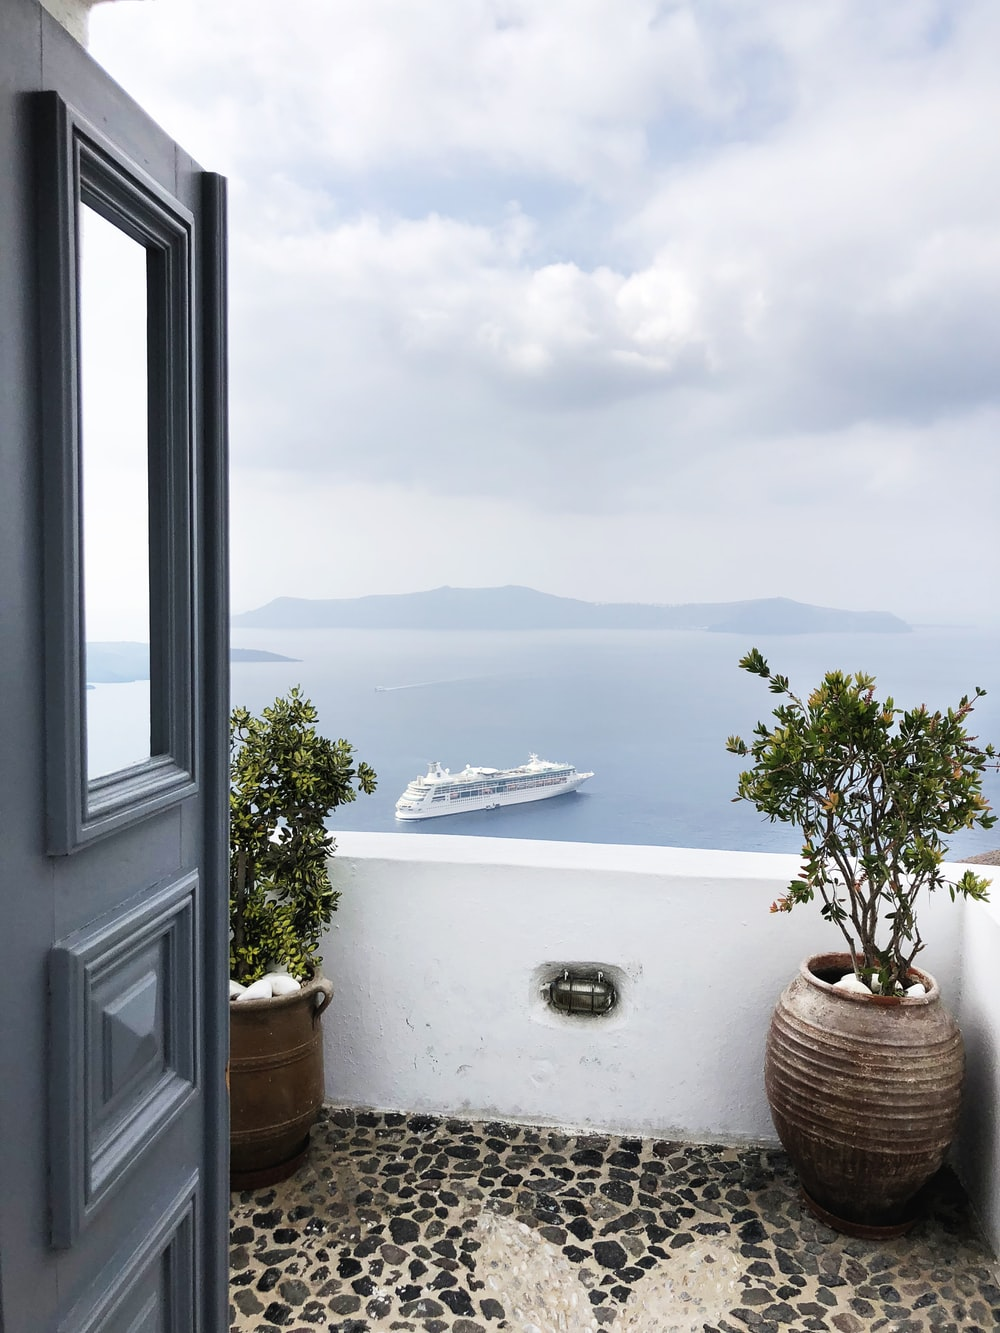 white cruise ship on ocean during daytime